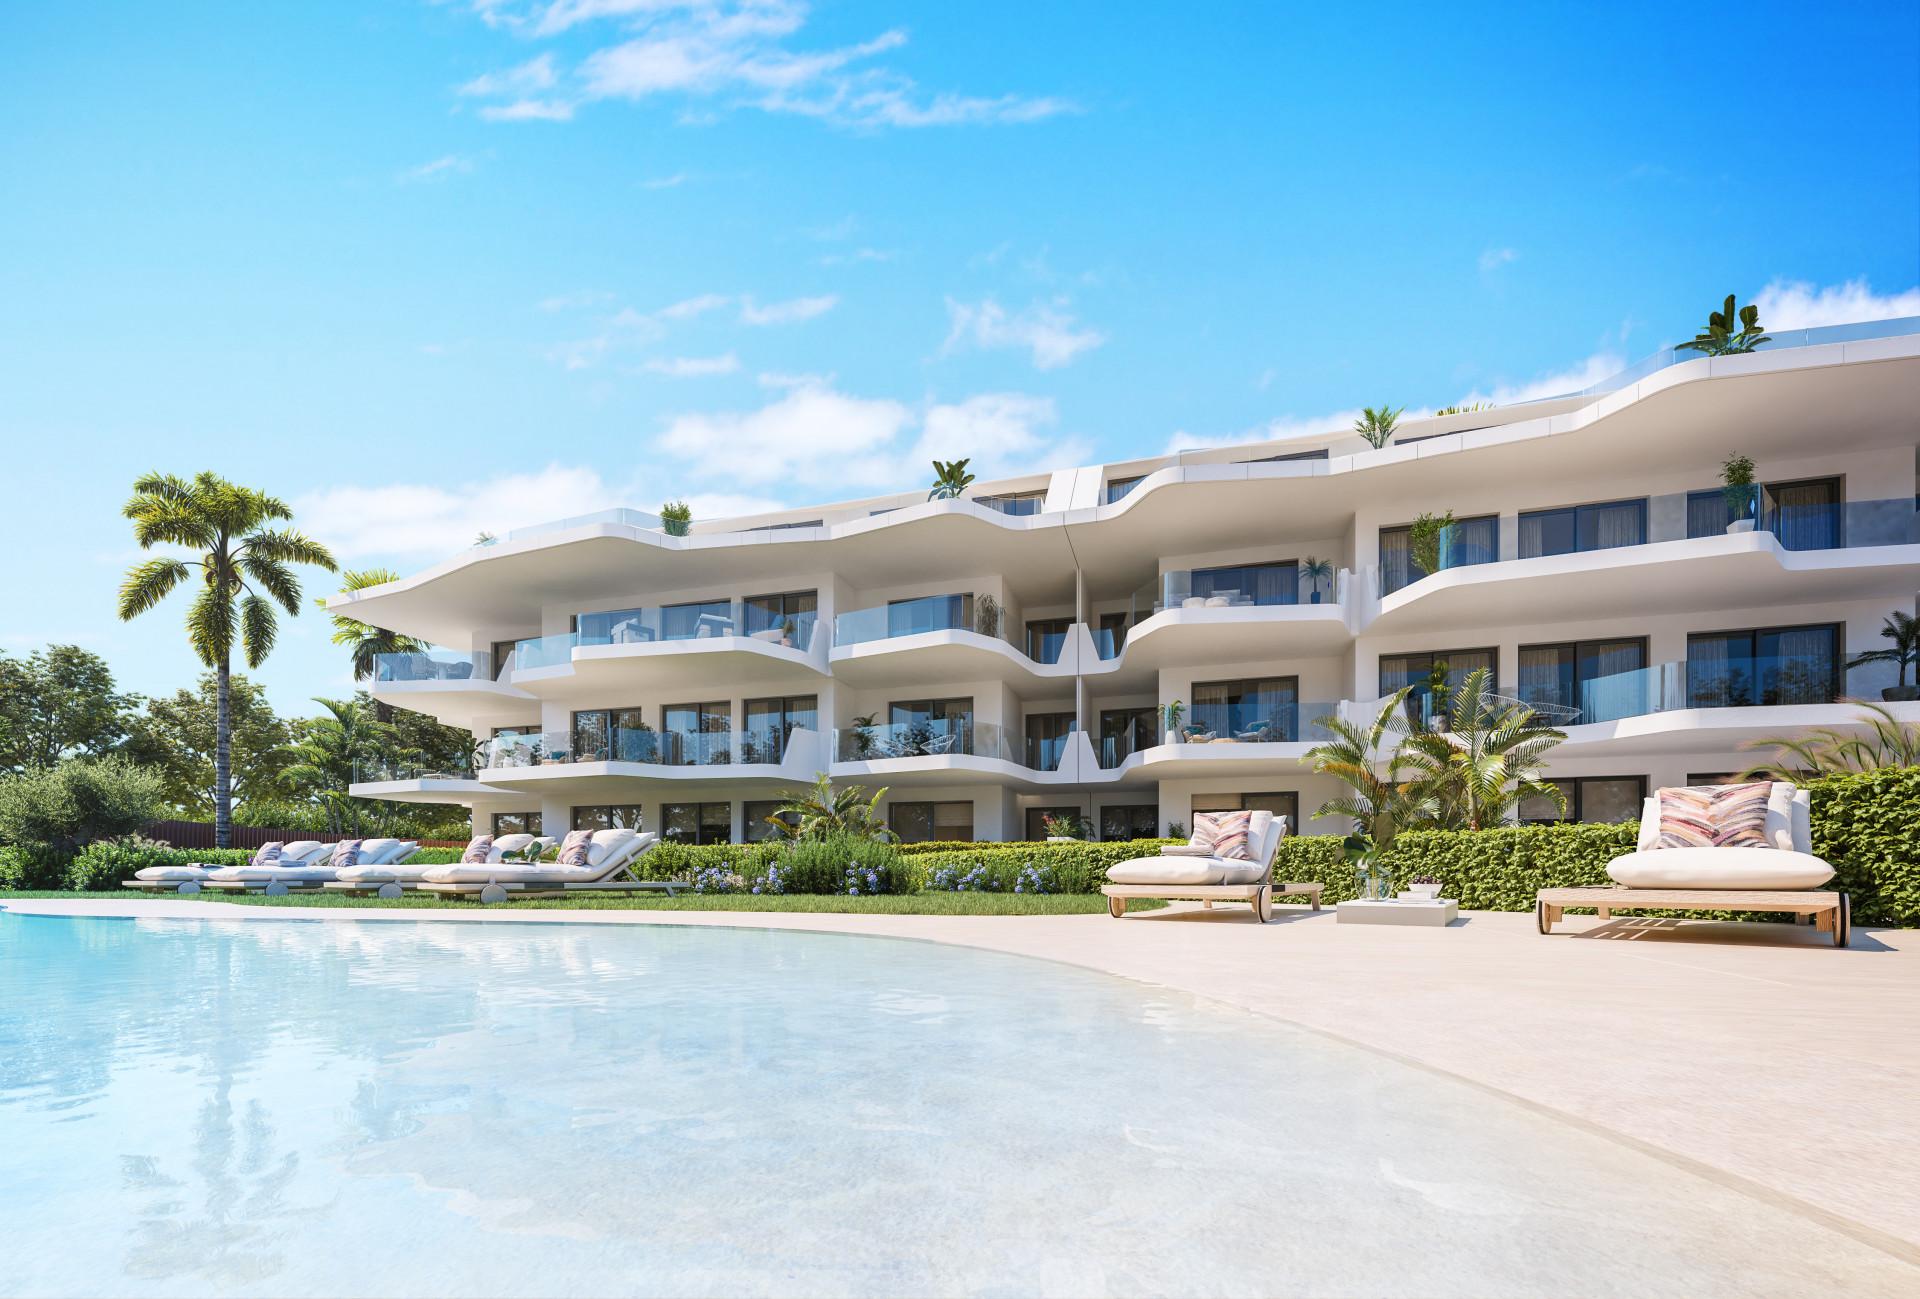 Apartment for sale in El Higueron, Fuengirola